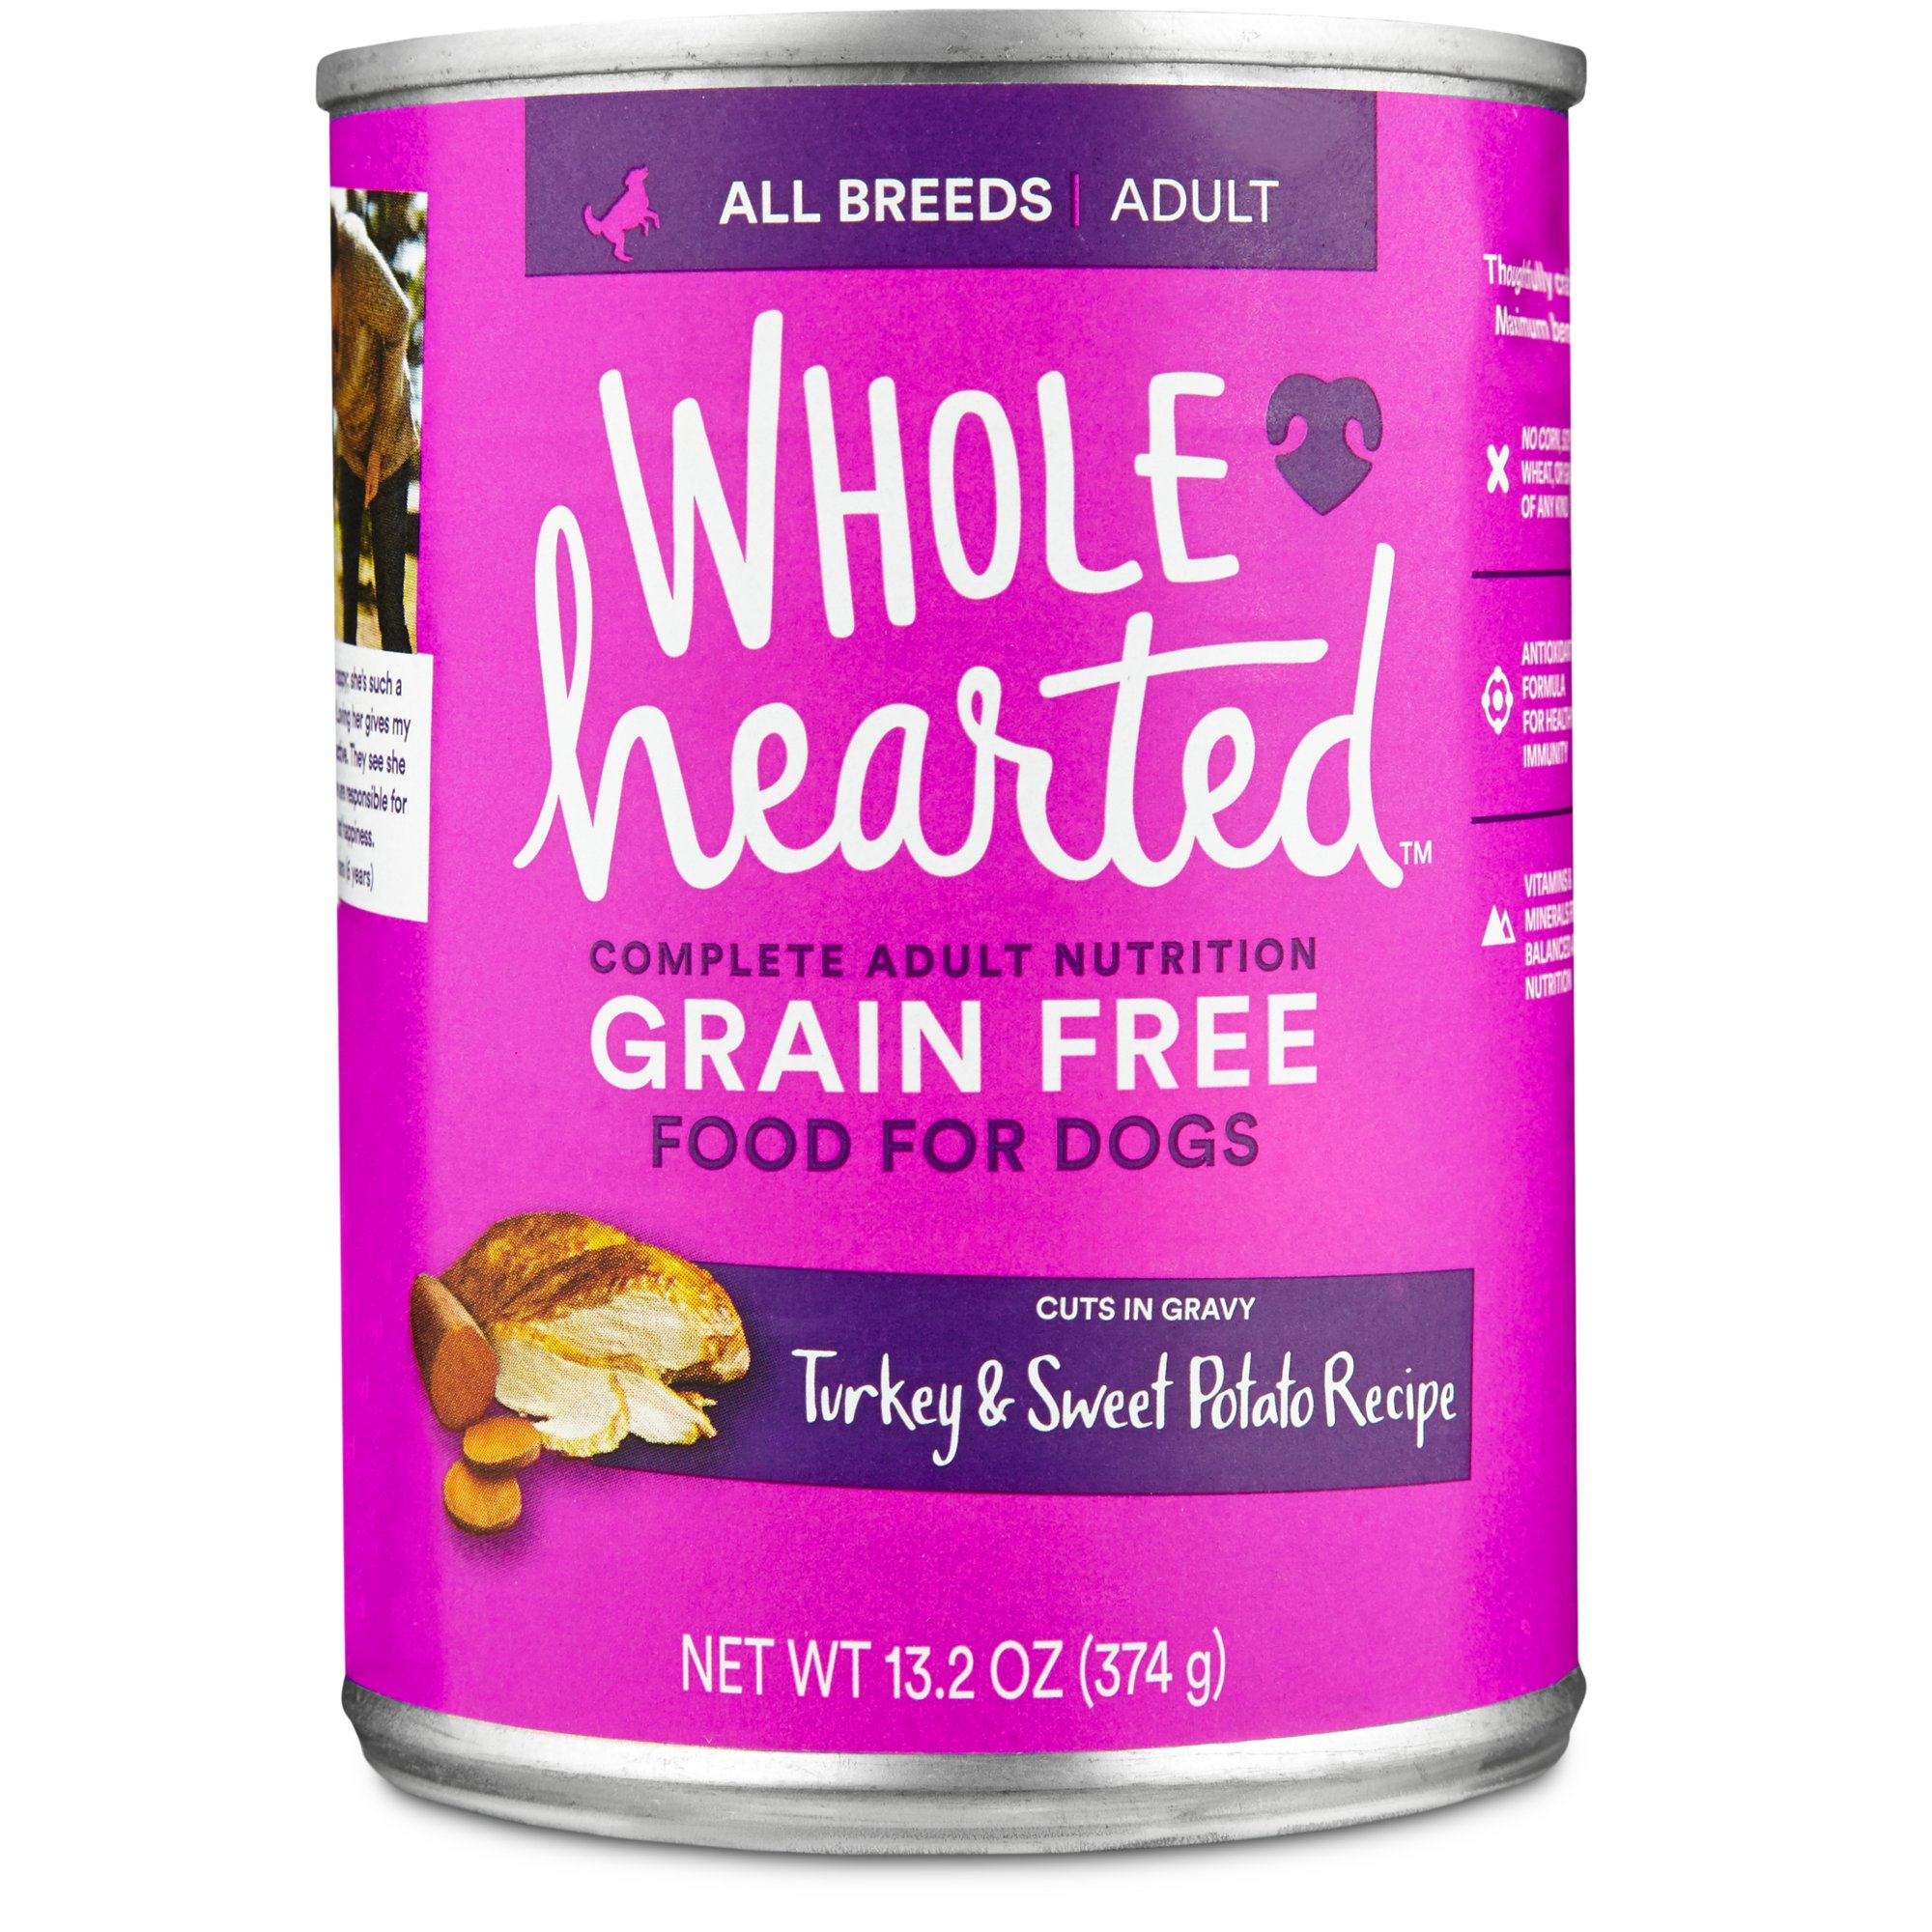 Wholehearted Grain Free Adult Turkey And Sweet Potato